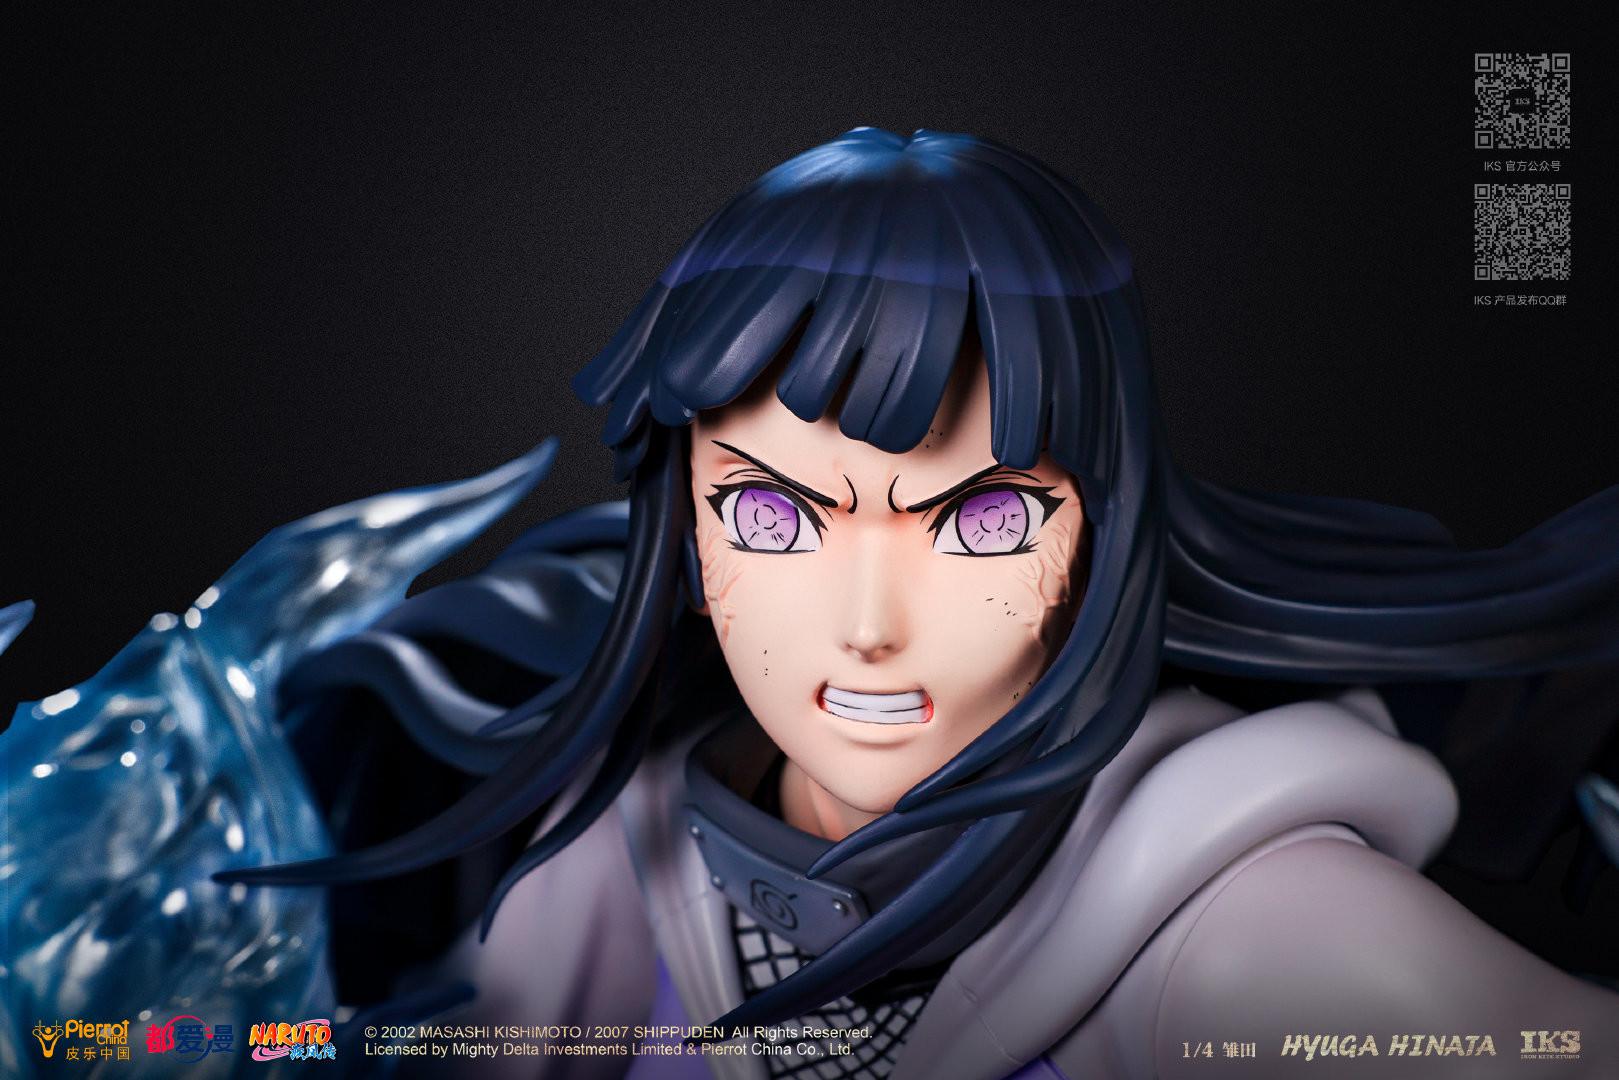 Link a Naruto la statua di Hinata Hyuga da Iron Kite Studio – (3)